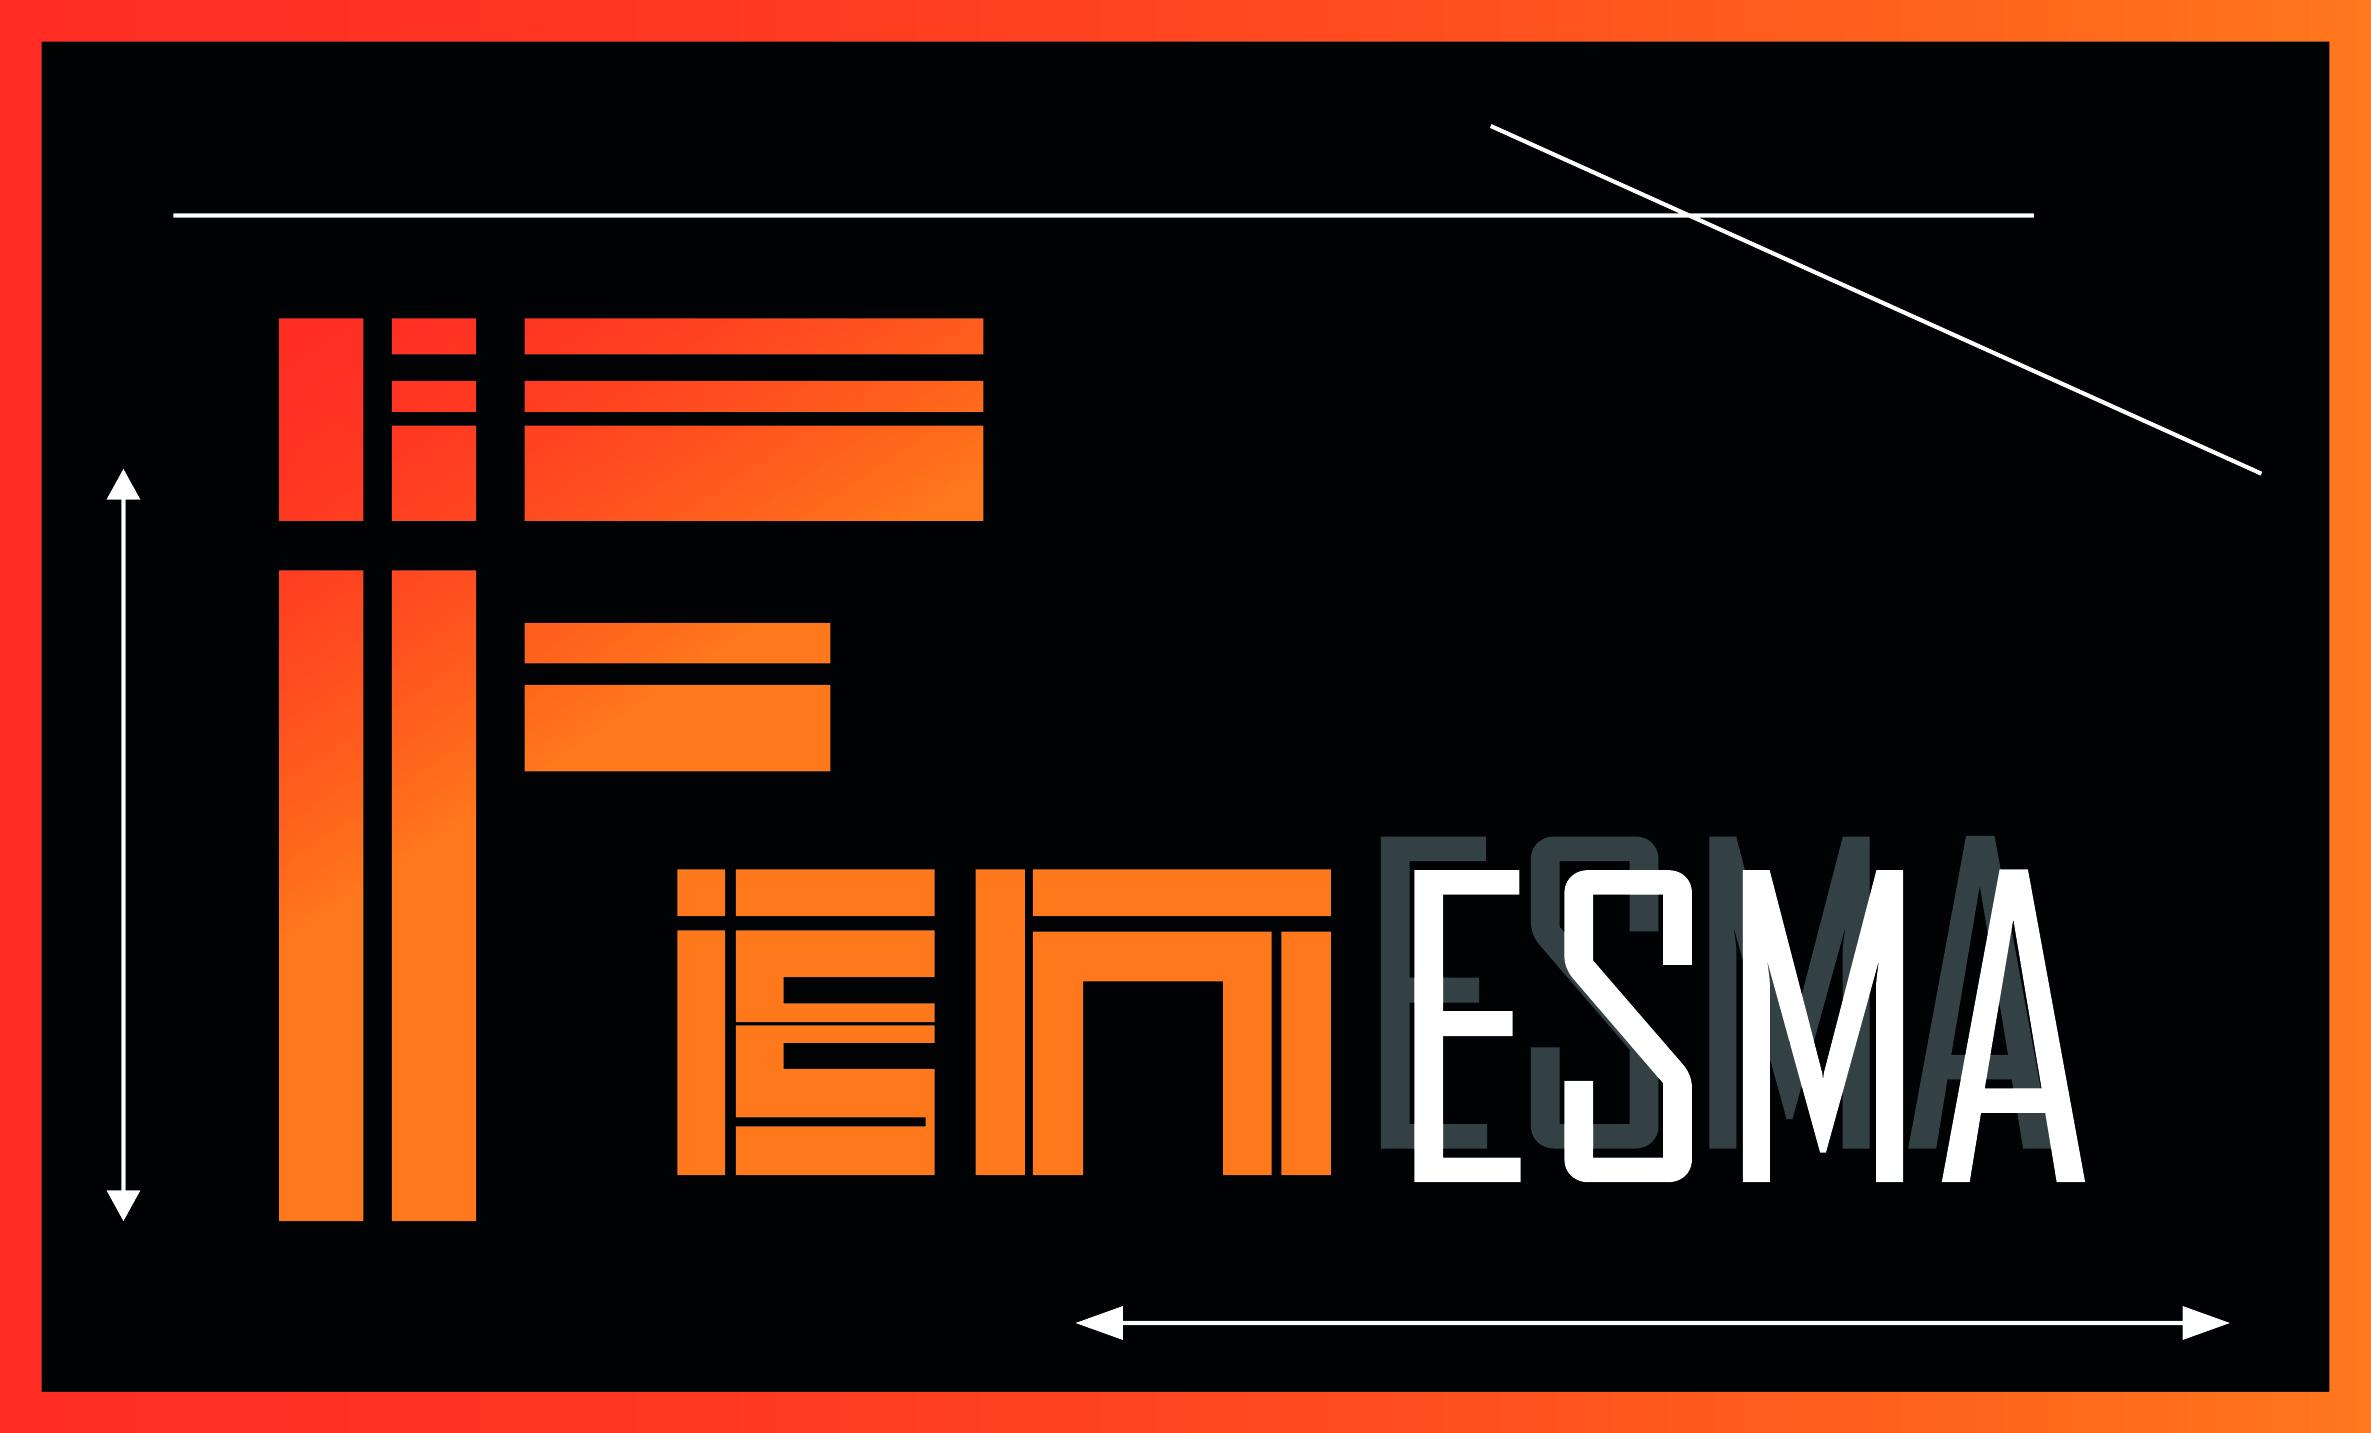 Fenólicos Esma